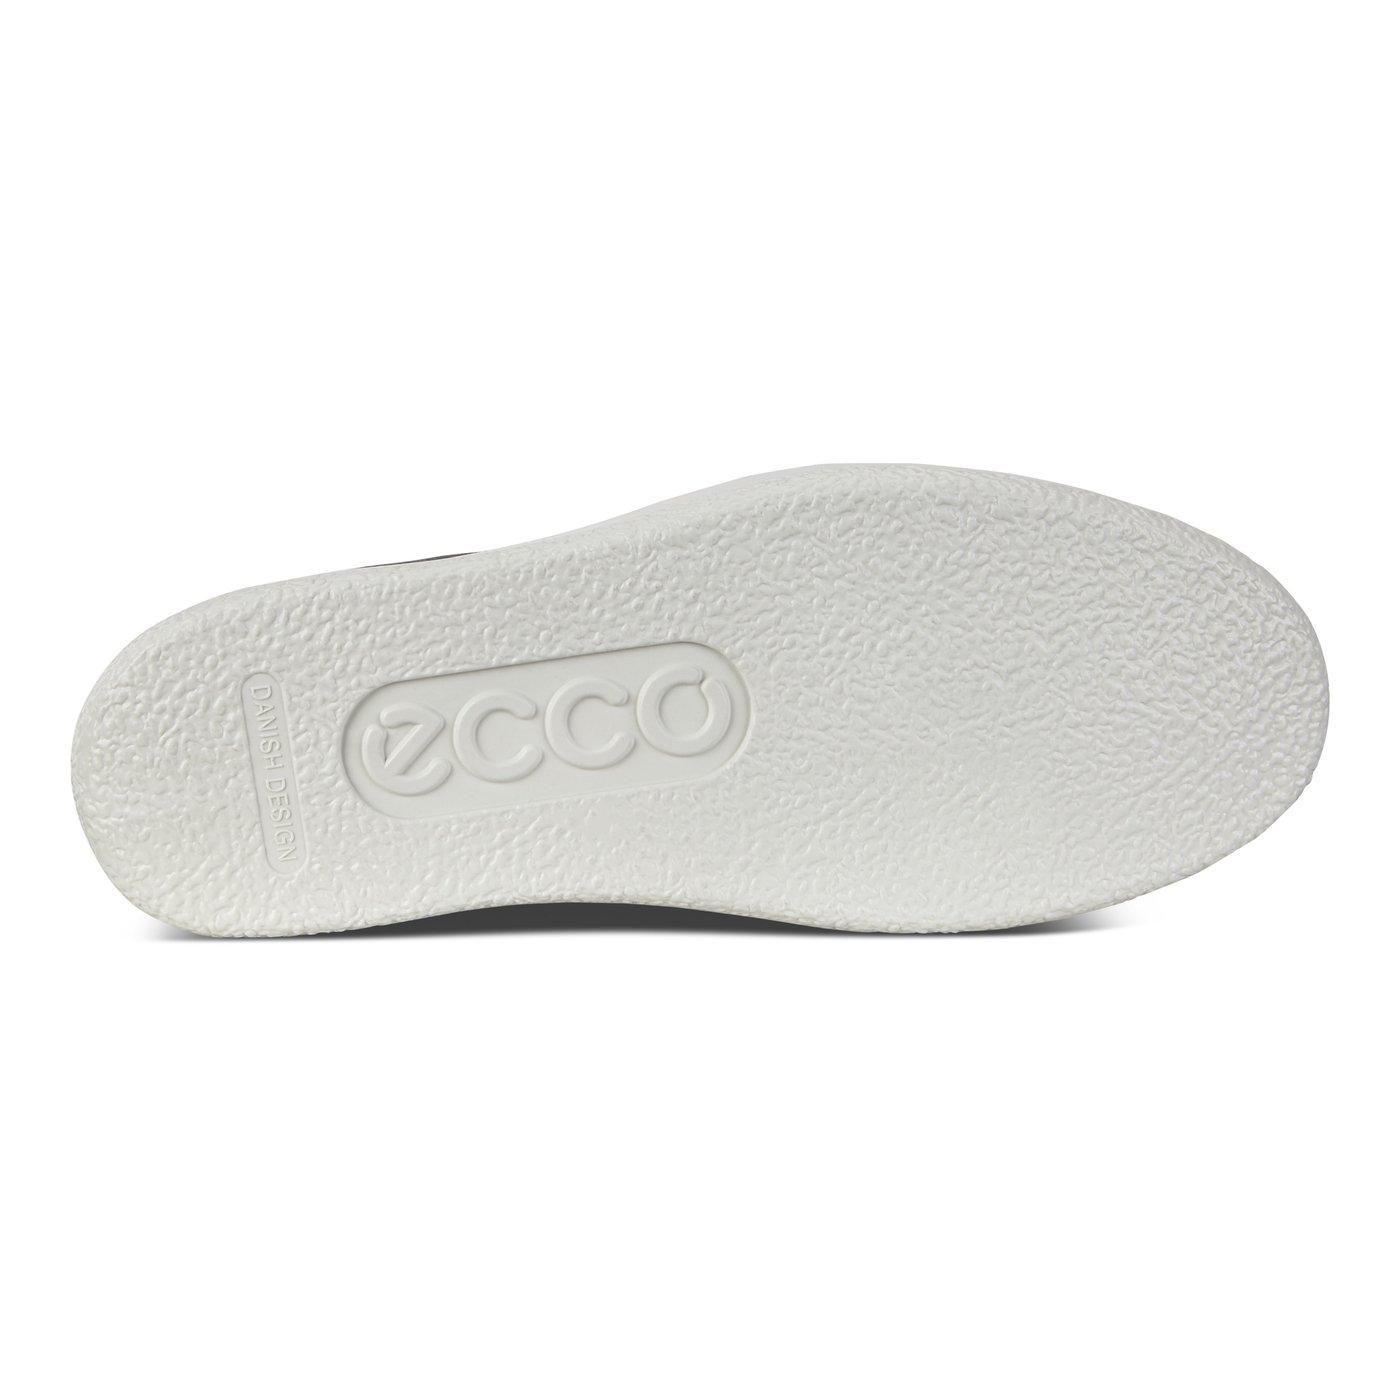 ECCO Soft 1 M High Top